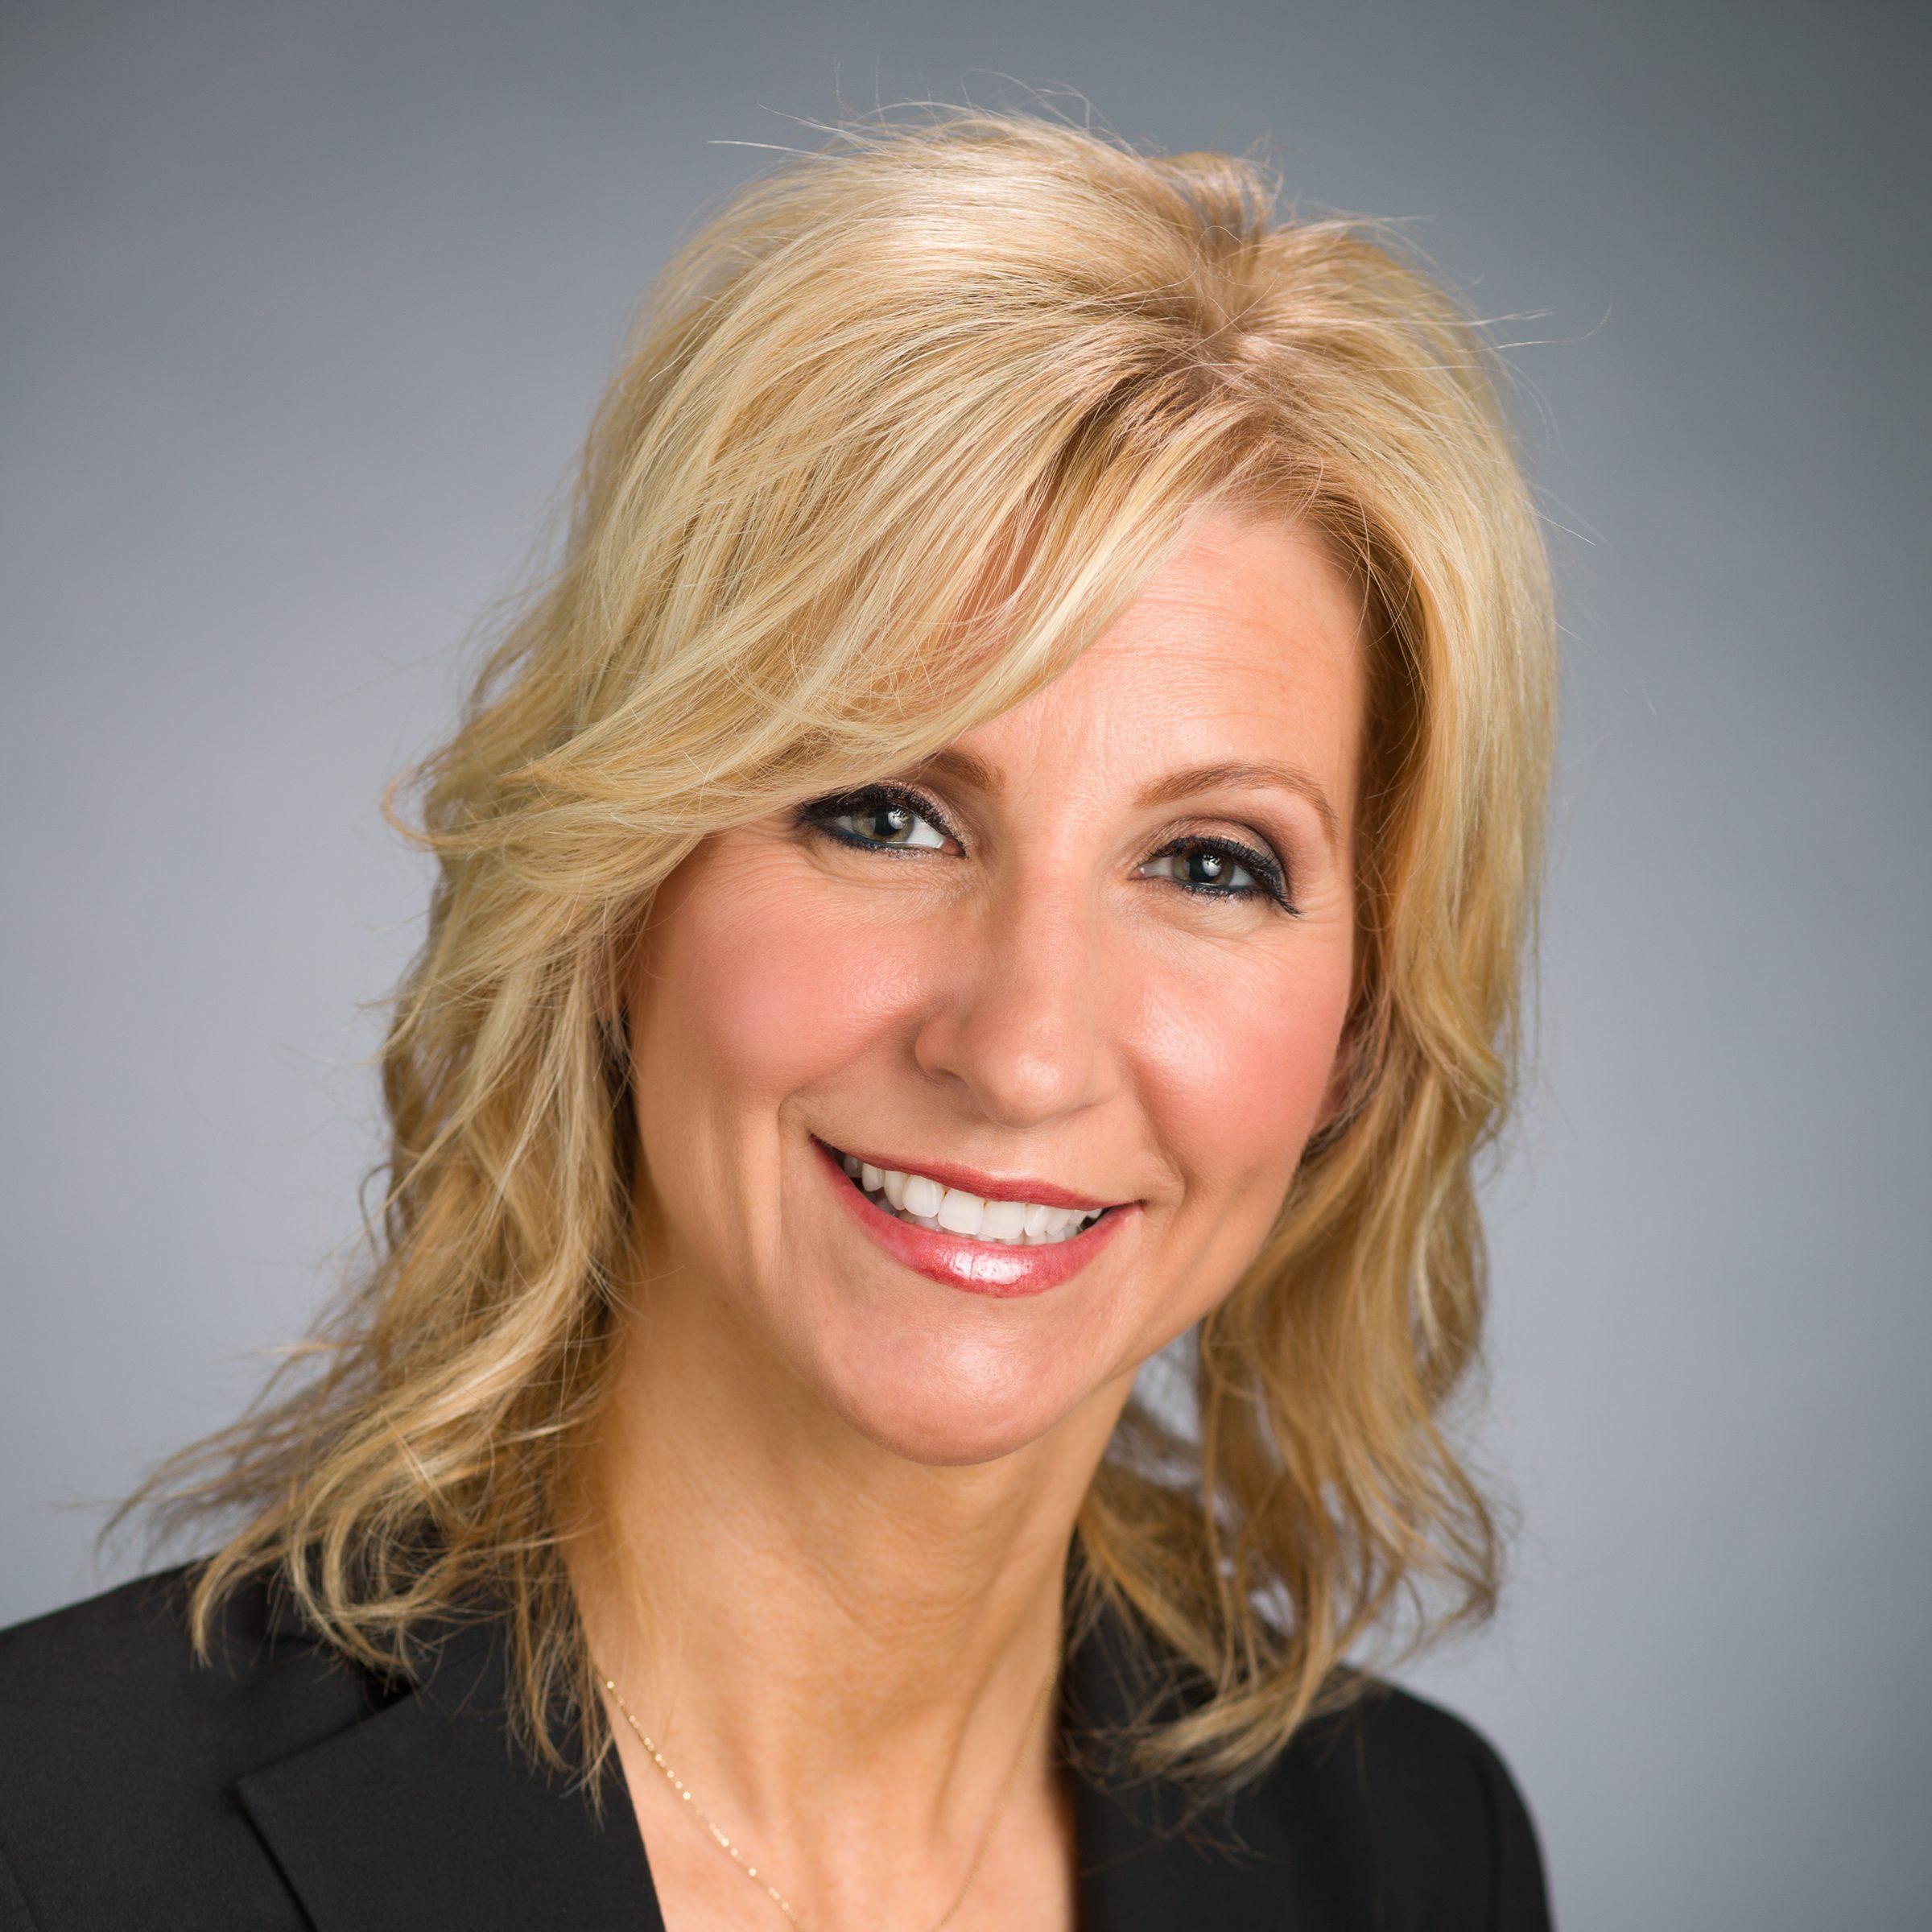 Sharon Reeve, PhD, Center Director